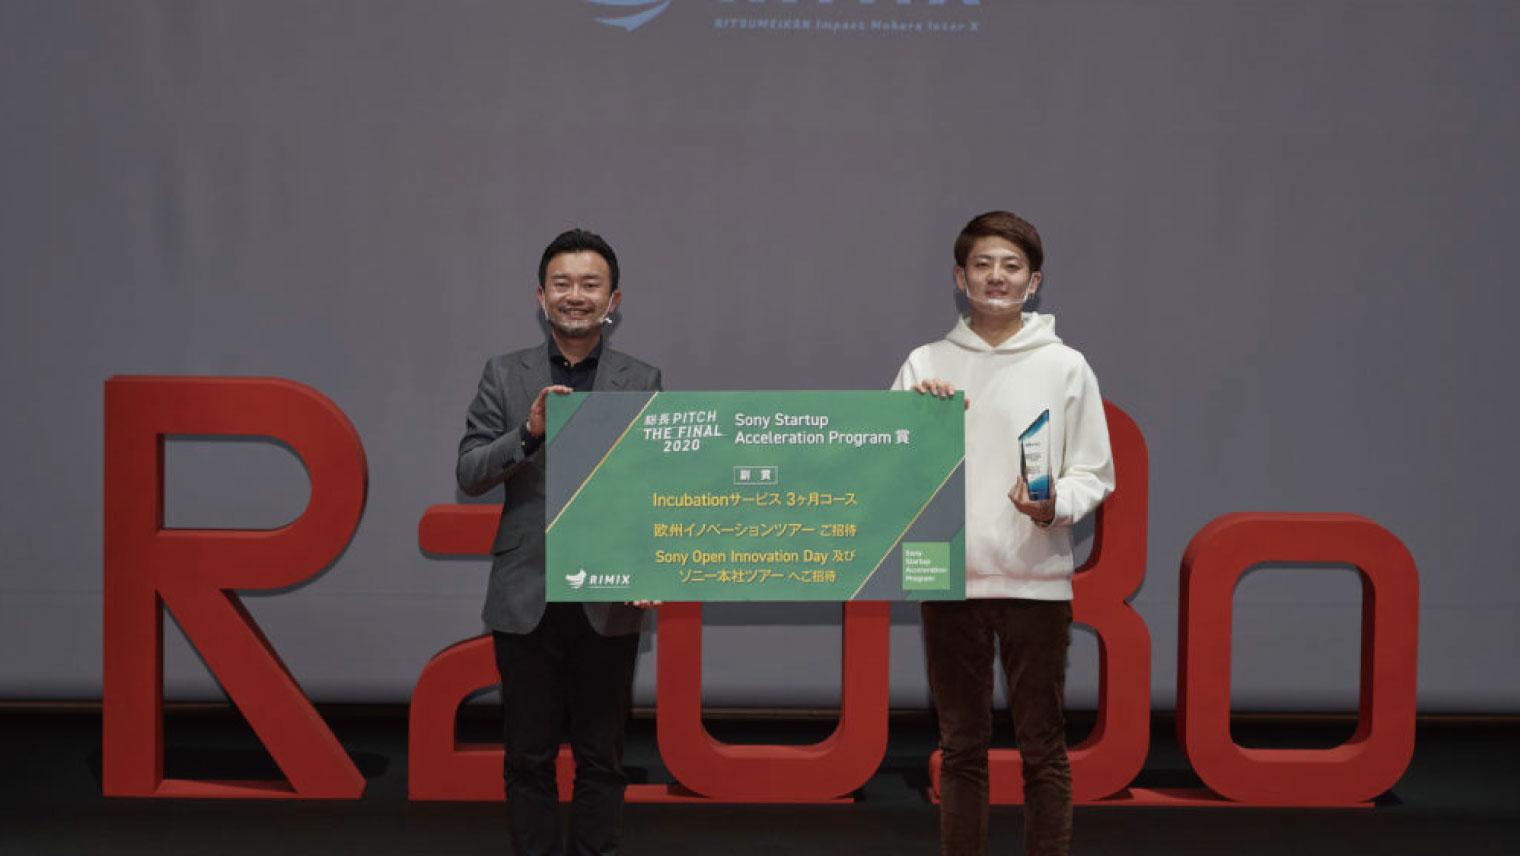 SSAP小田島と、SSAP賞を受賞した内山浩輝さん(立命館アジア太平洋大学アジア太平洋学部4回生)